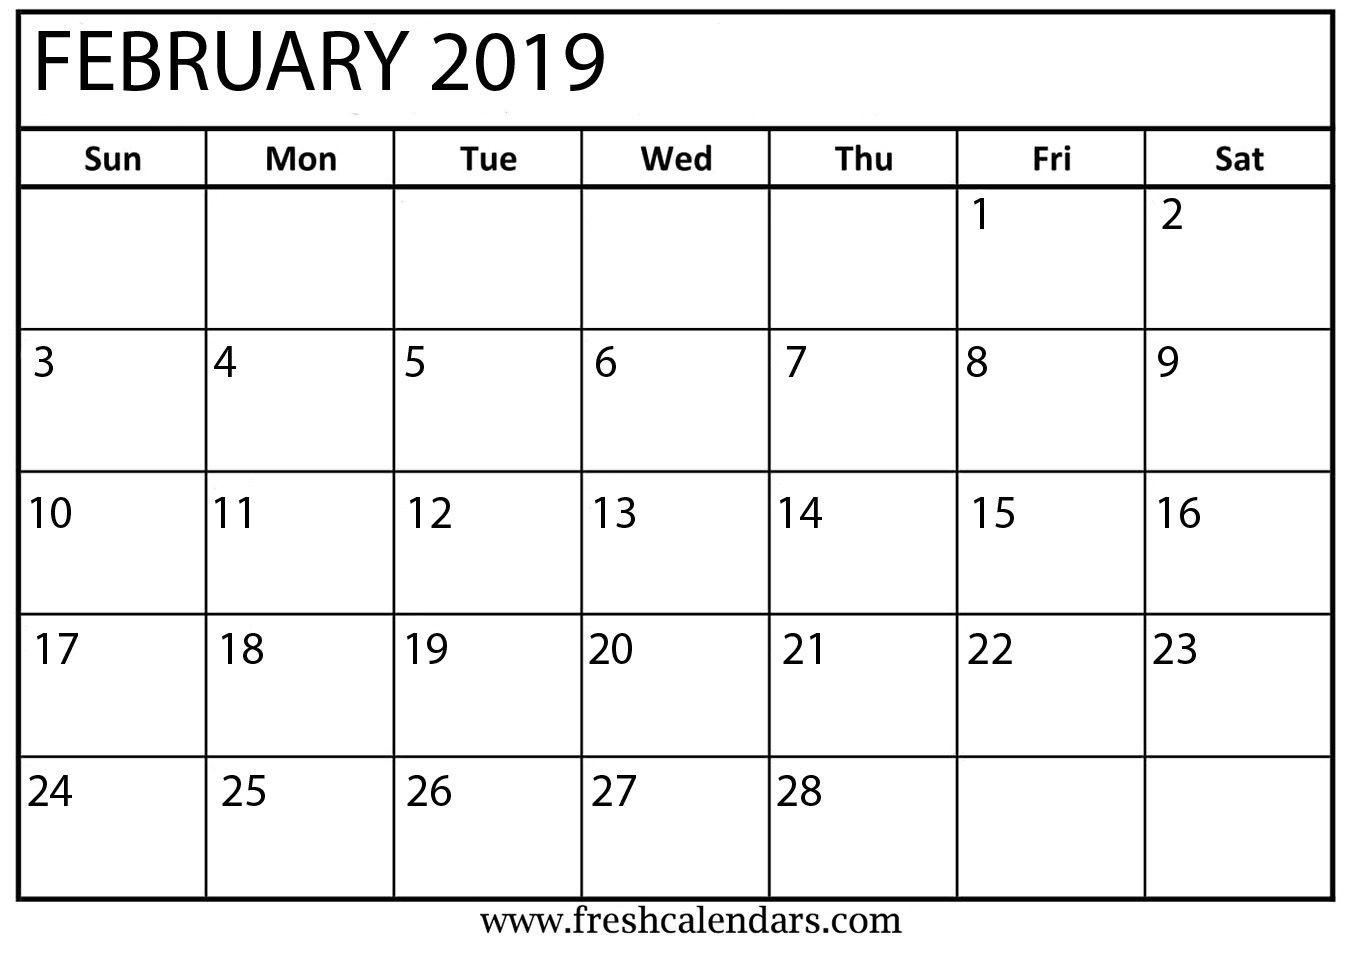 February Month Calendar 2019 Blank Template | Blank February 2019_Blank Calendar Template Kindergarten